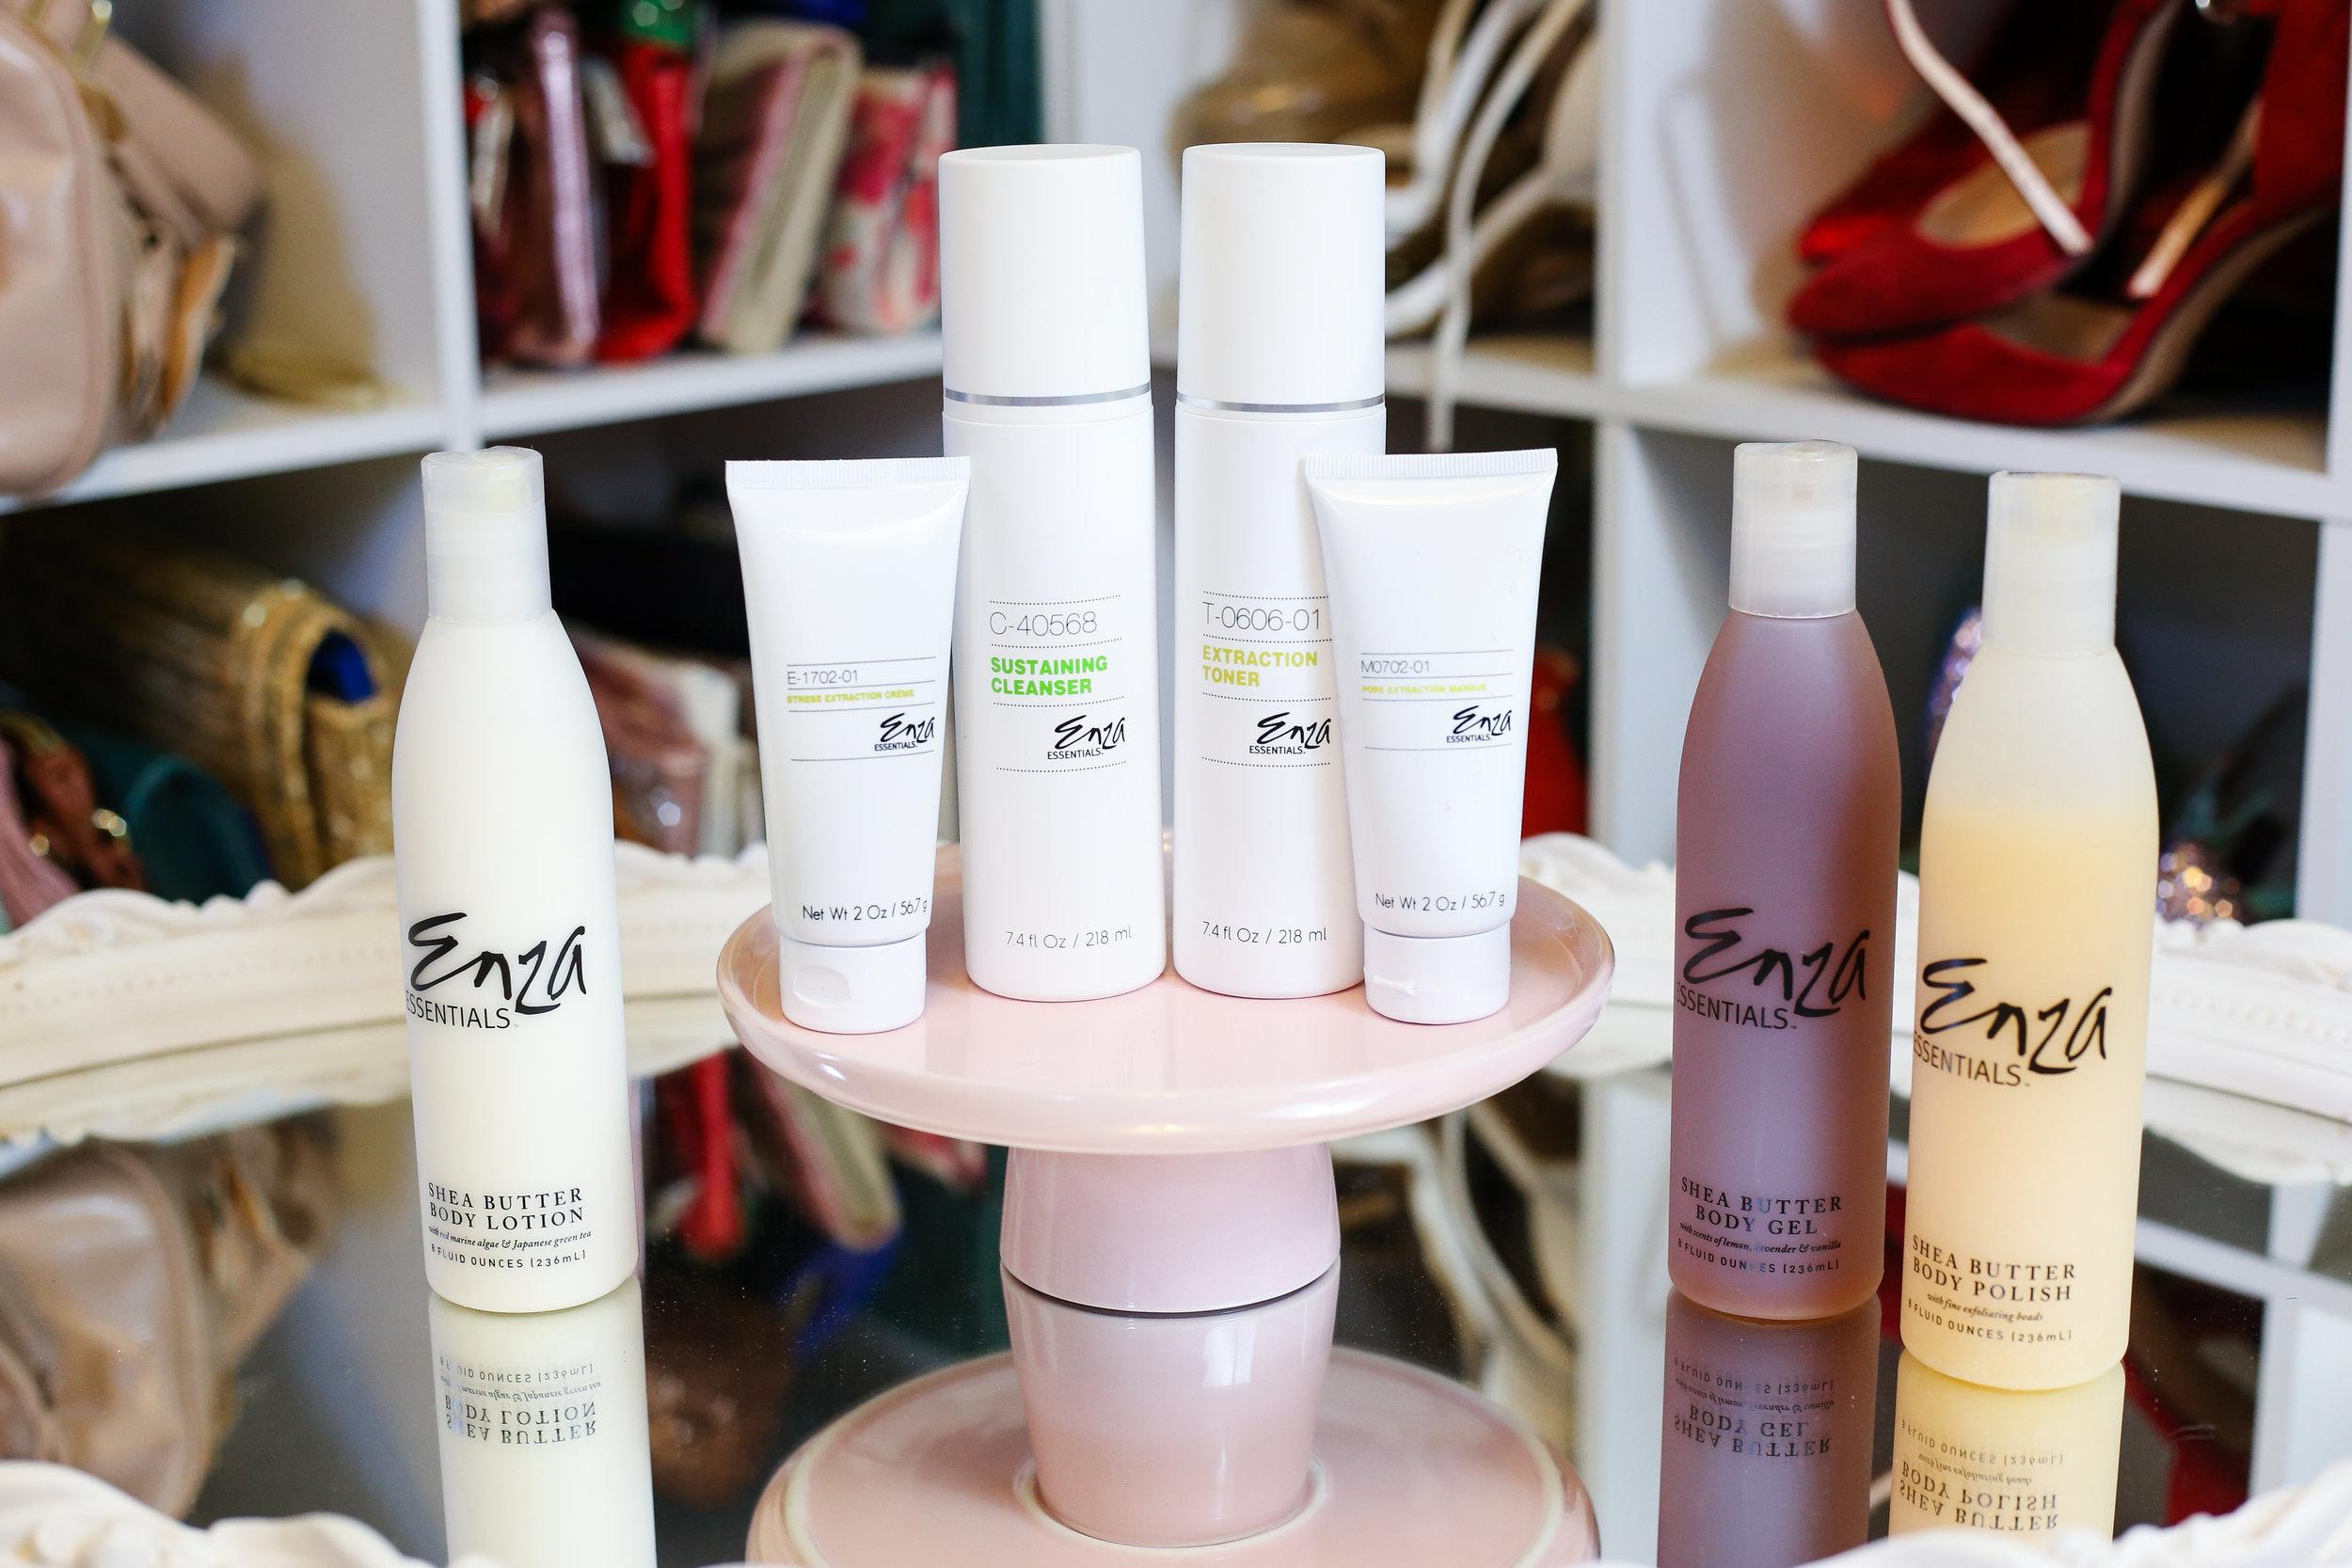 Enza Essentials- Enchanting Elegance